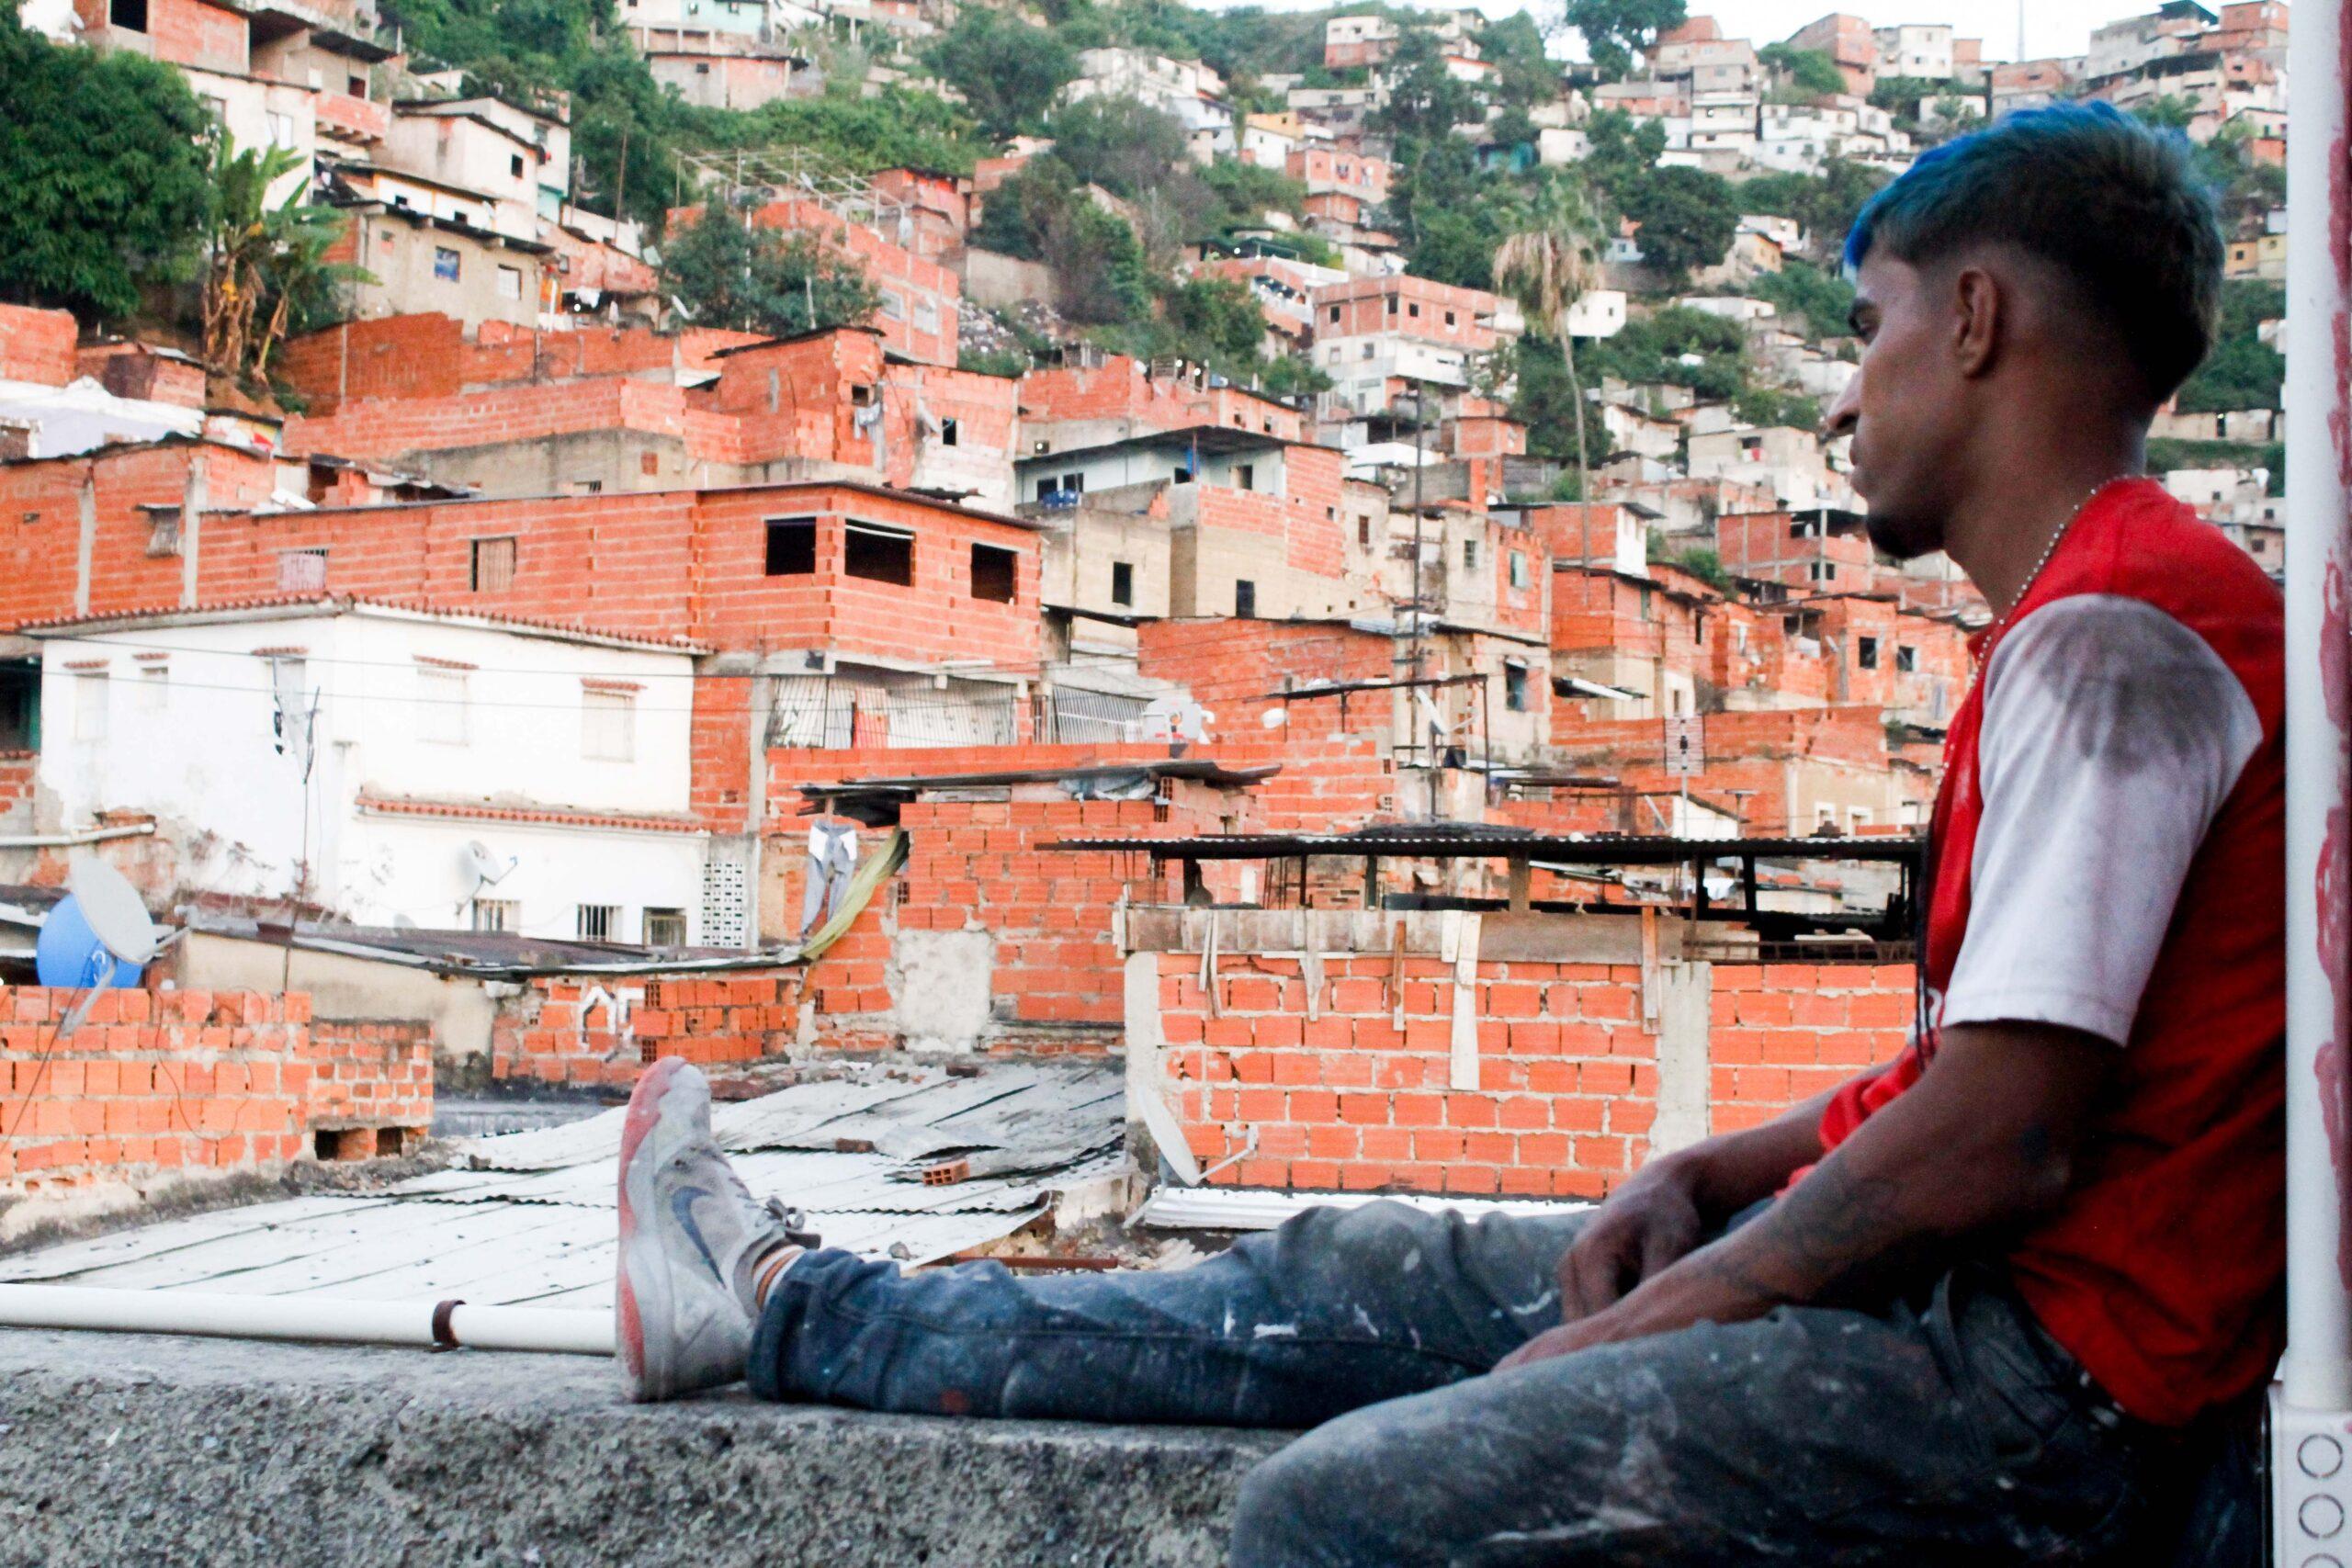 Caracas Resiliente - Ser caraqueño